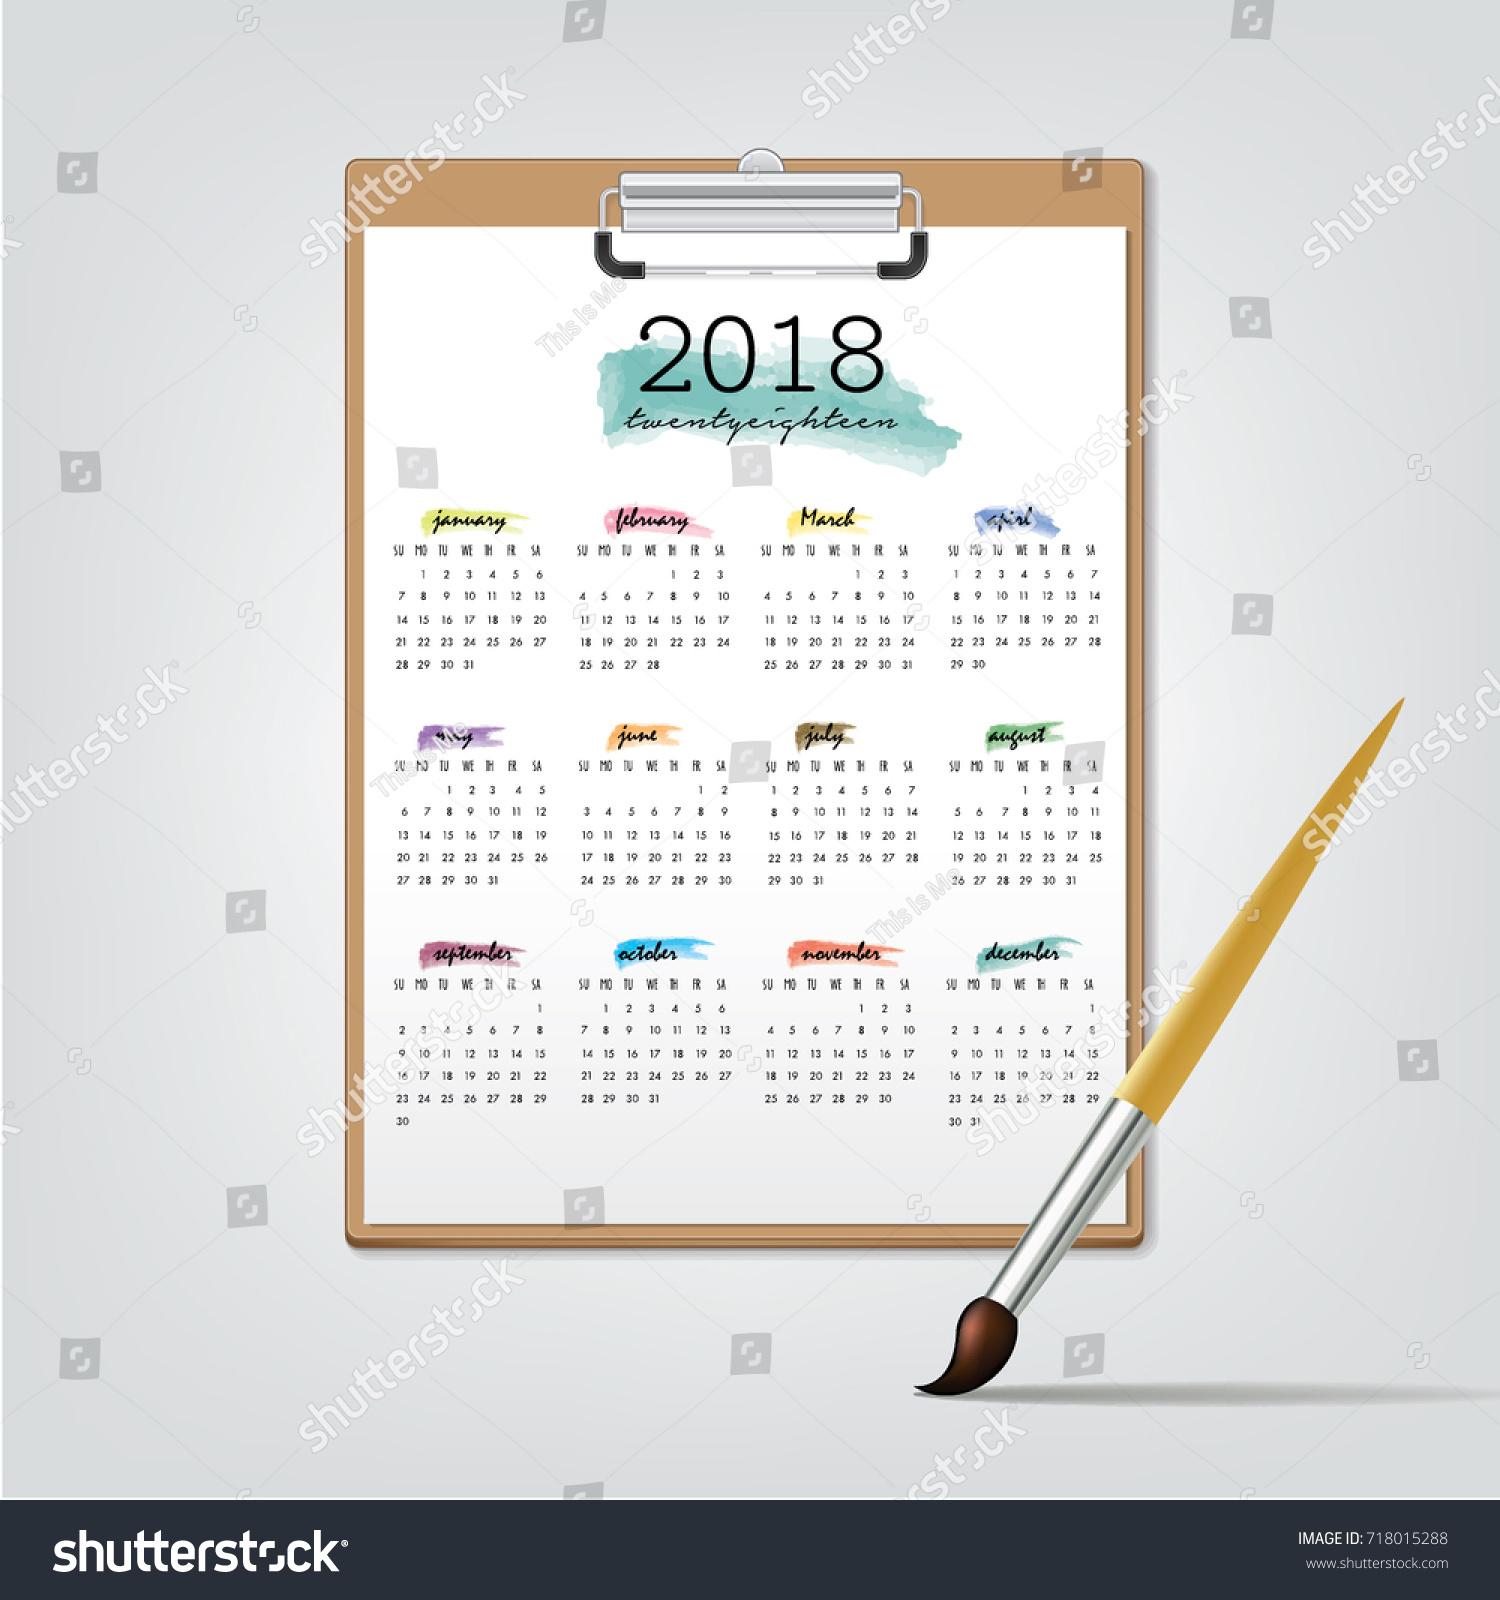 January December Desktop Calendar 2018 Years Week starts Monday Vector stationery color